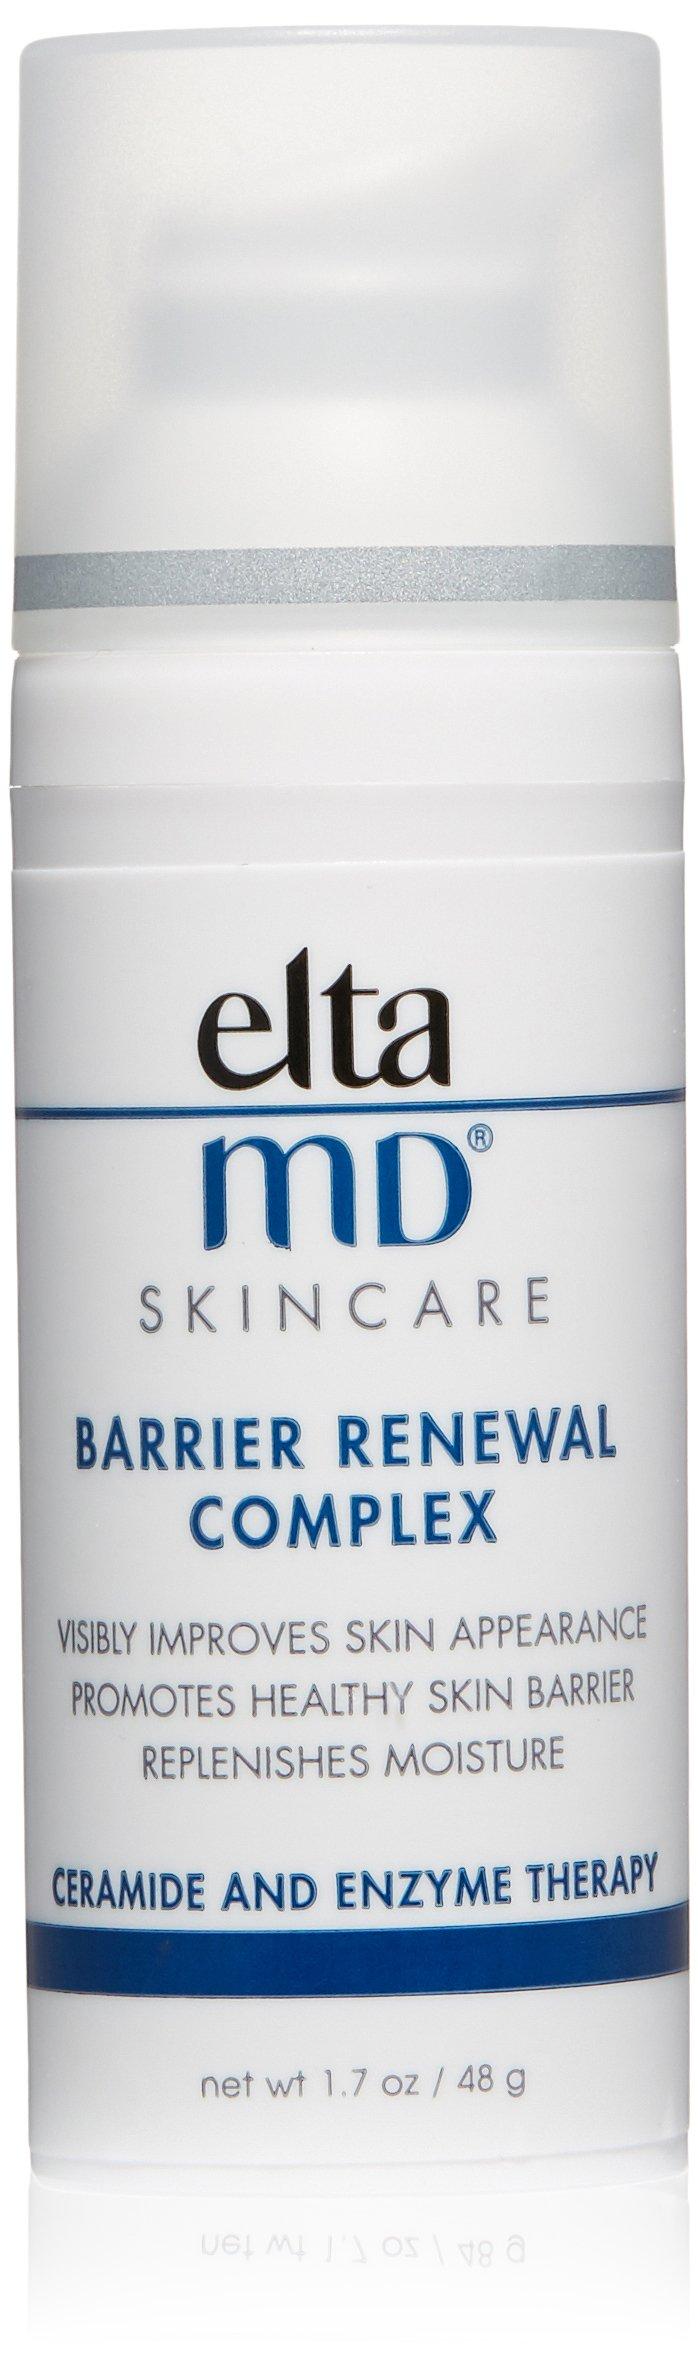 EltaMD Barrier Renewal Complex Facial and After Shave Moisturizer for Dry Skin, Dermatologist-Recommended, 1.7 oz